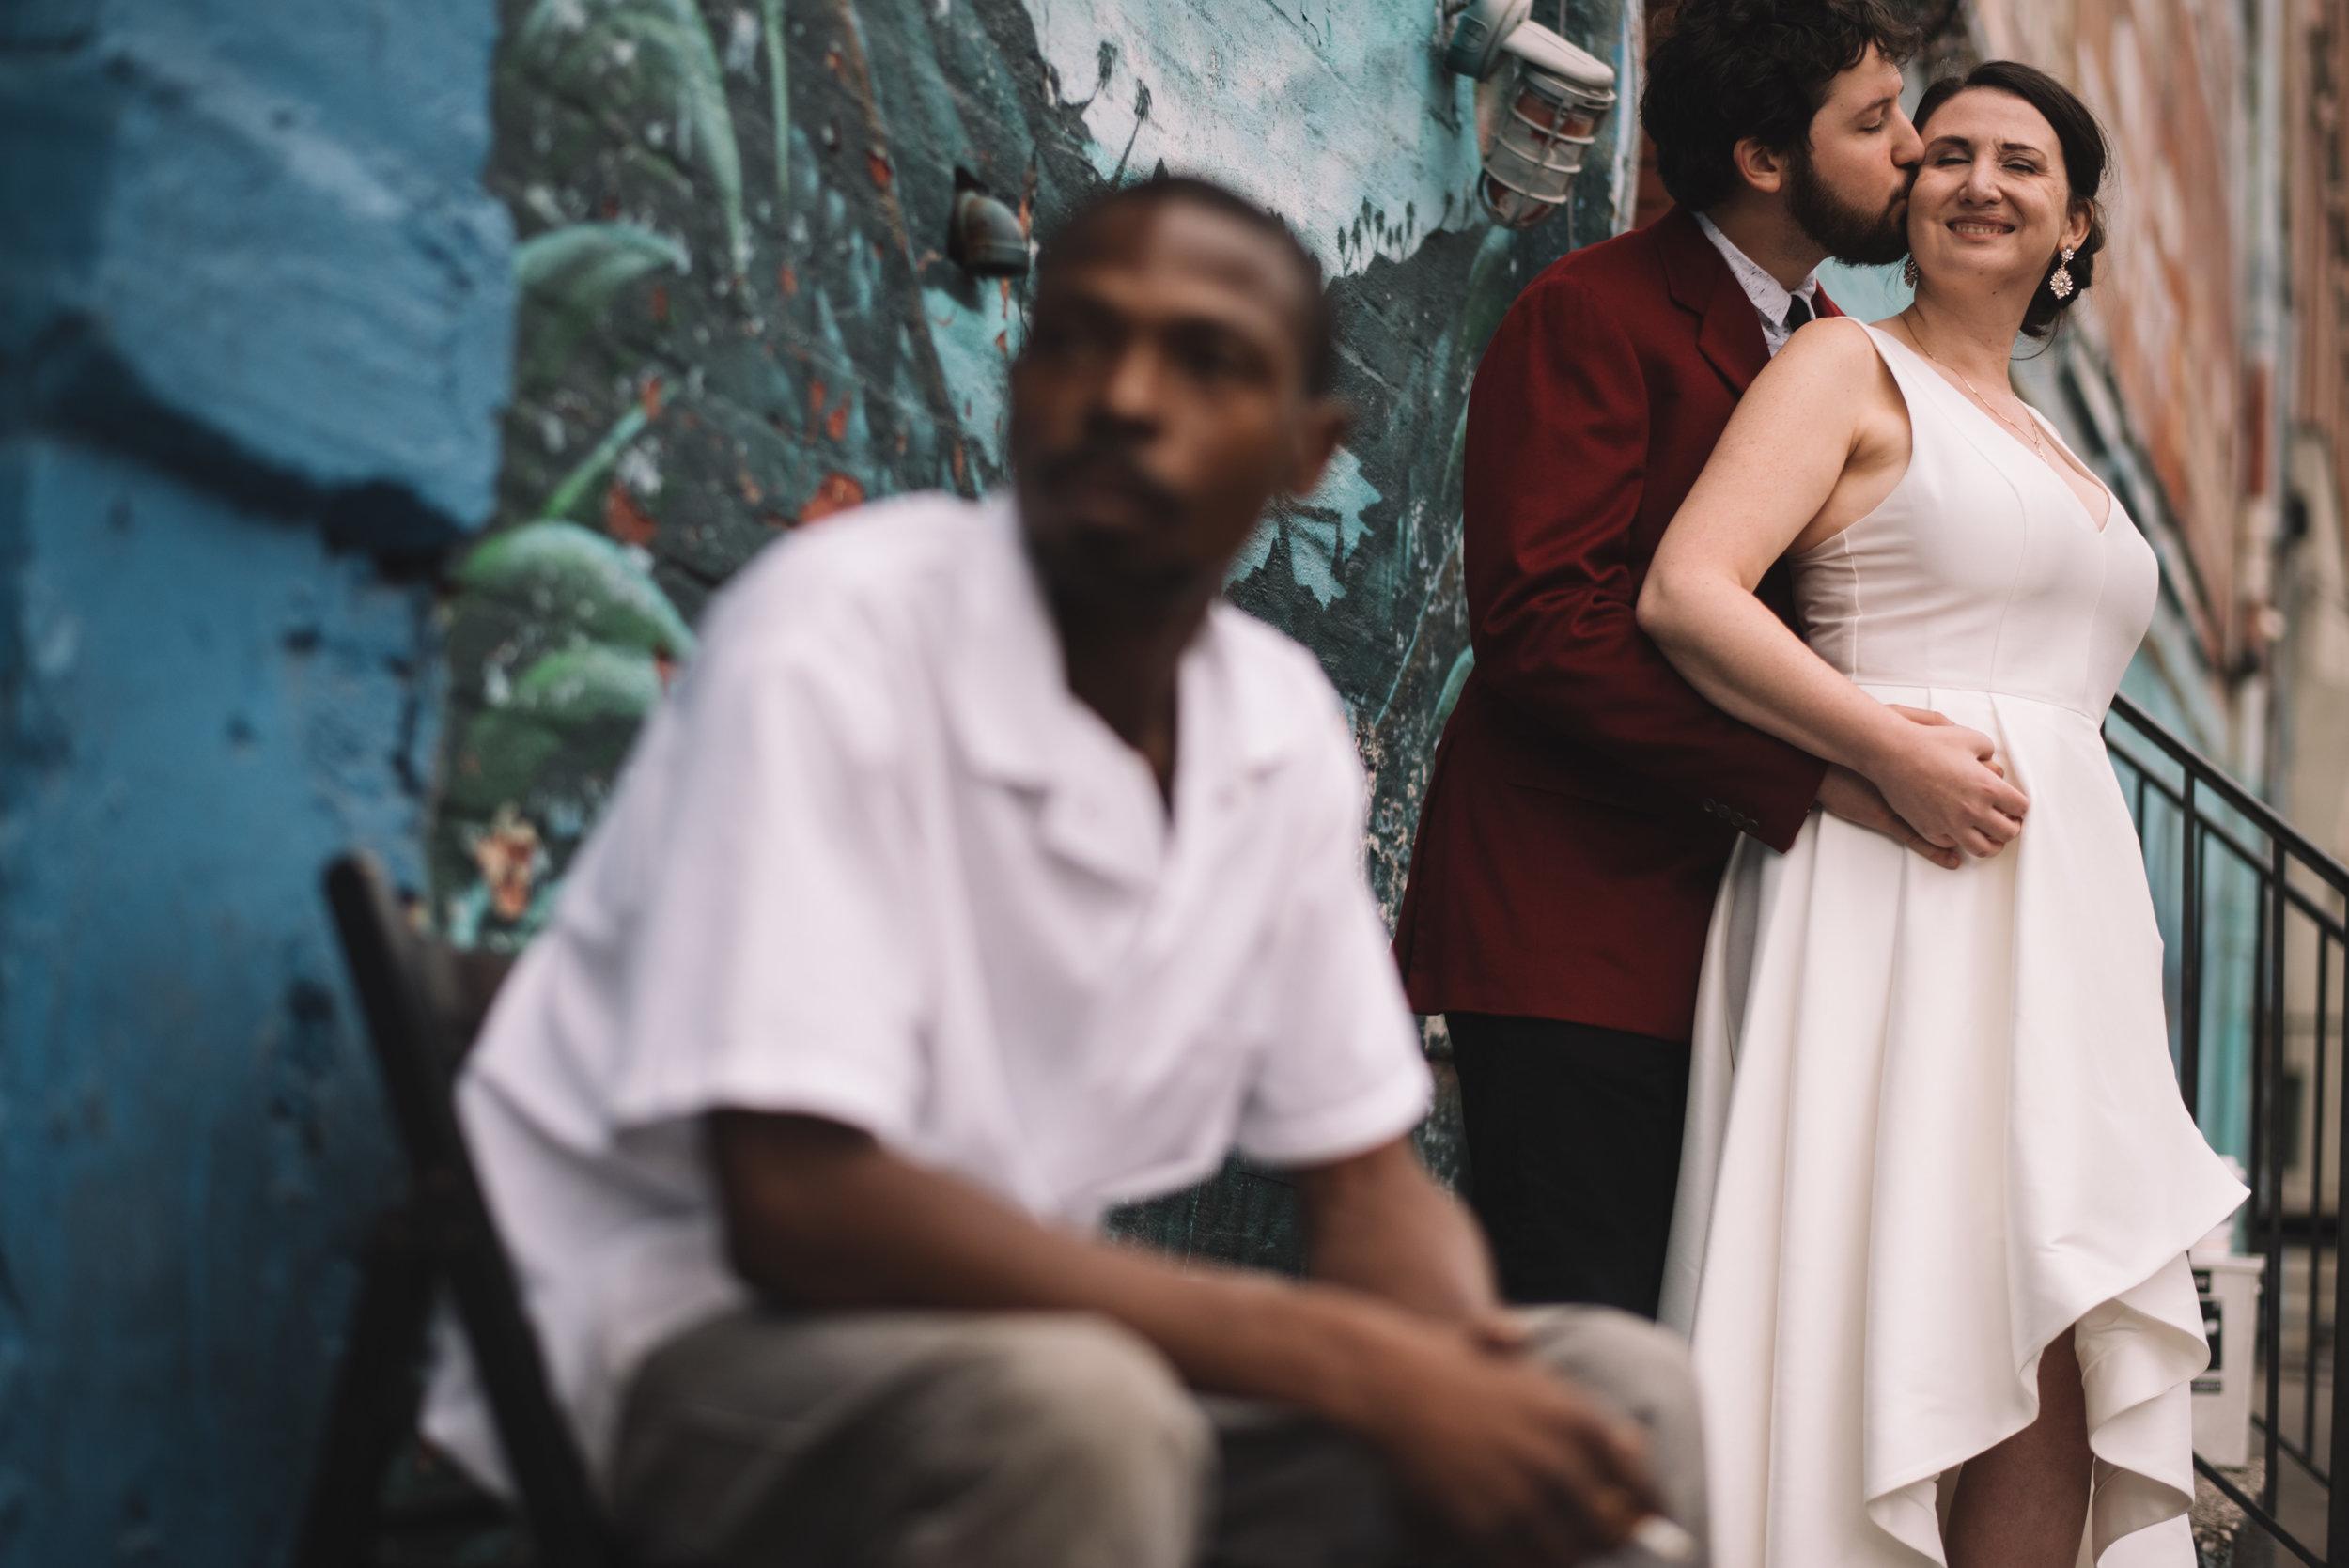 WeddingPhotos | NJPhotographer | Highlights-10-16.jpg